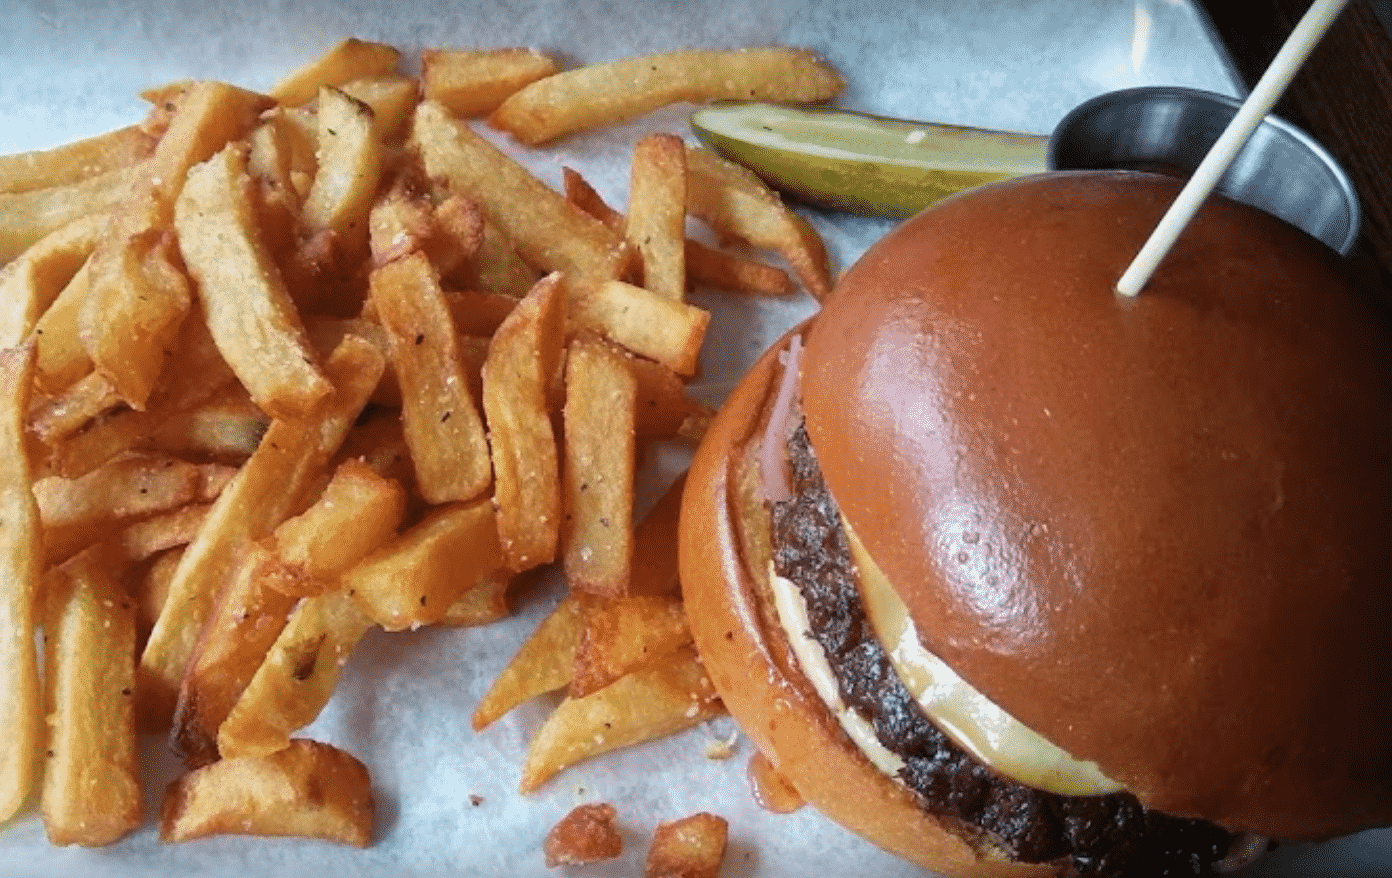 Buddy Whos Burger in NJ